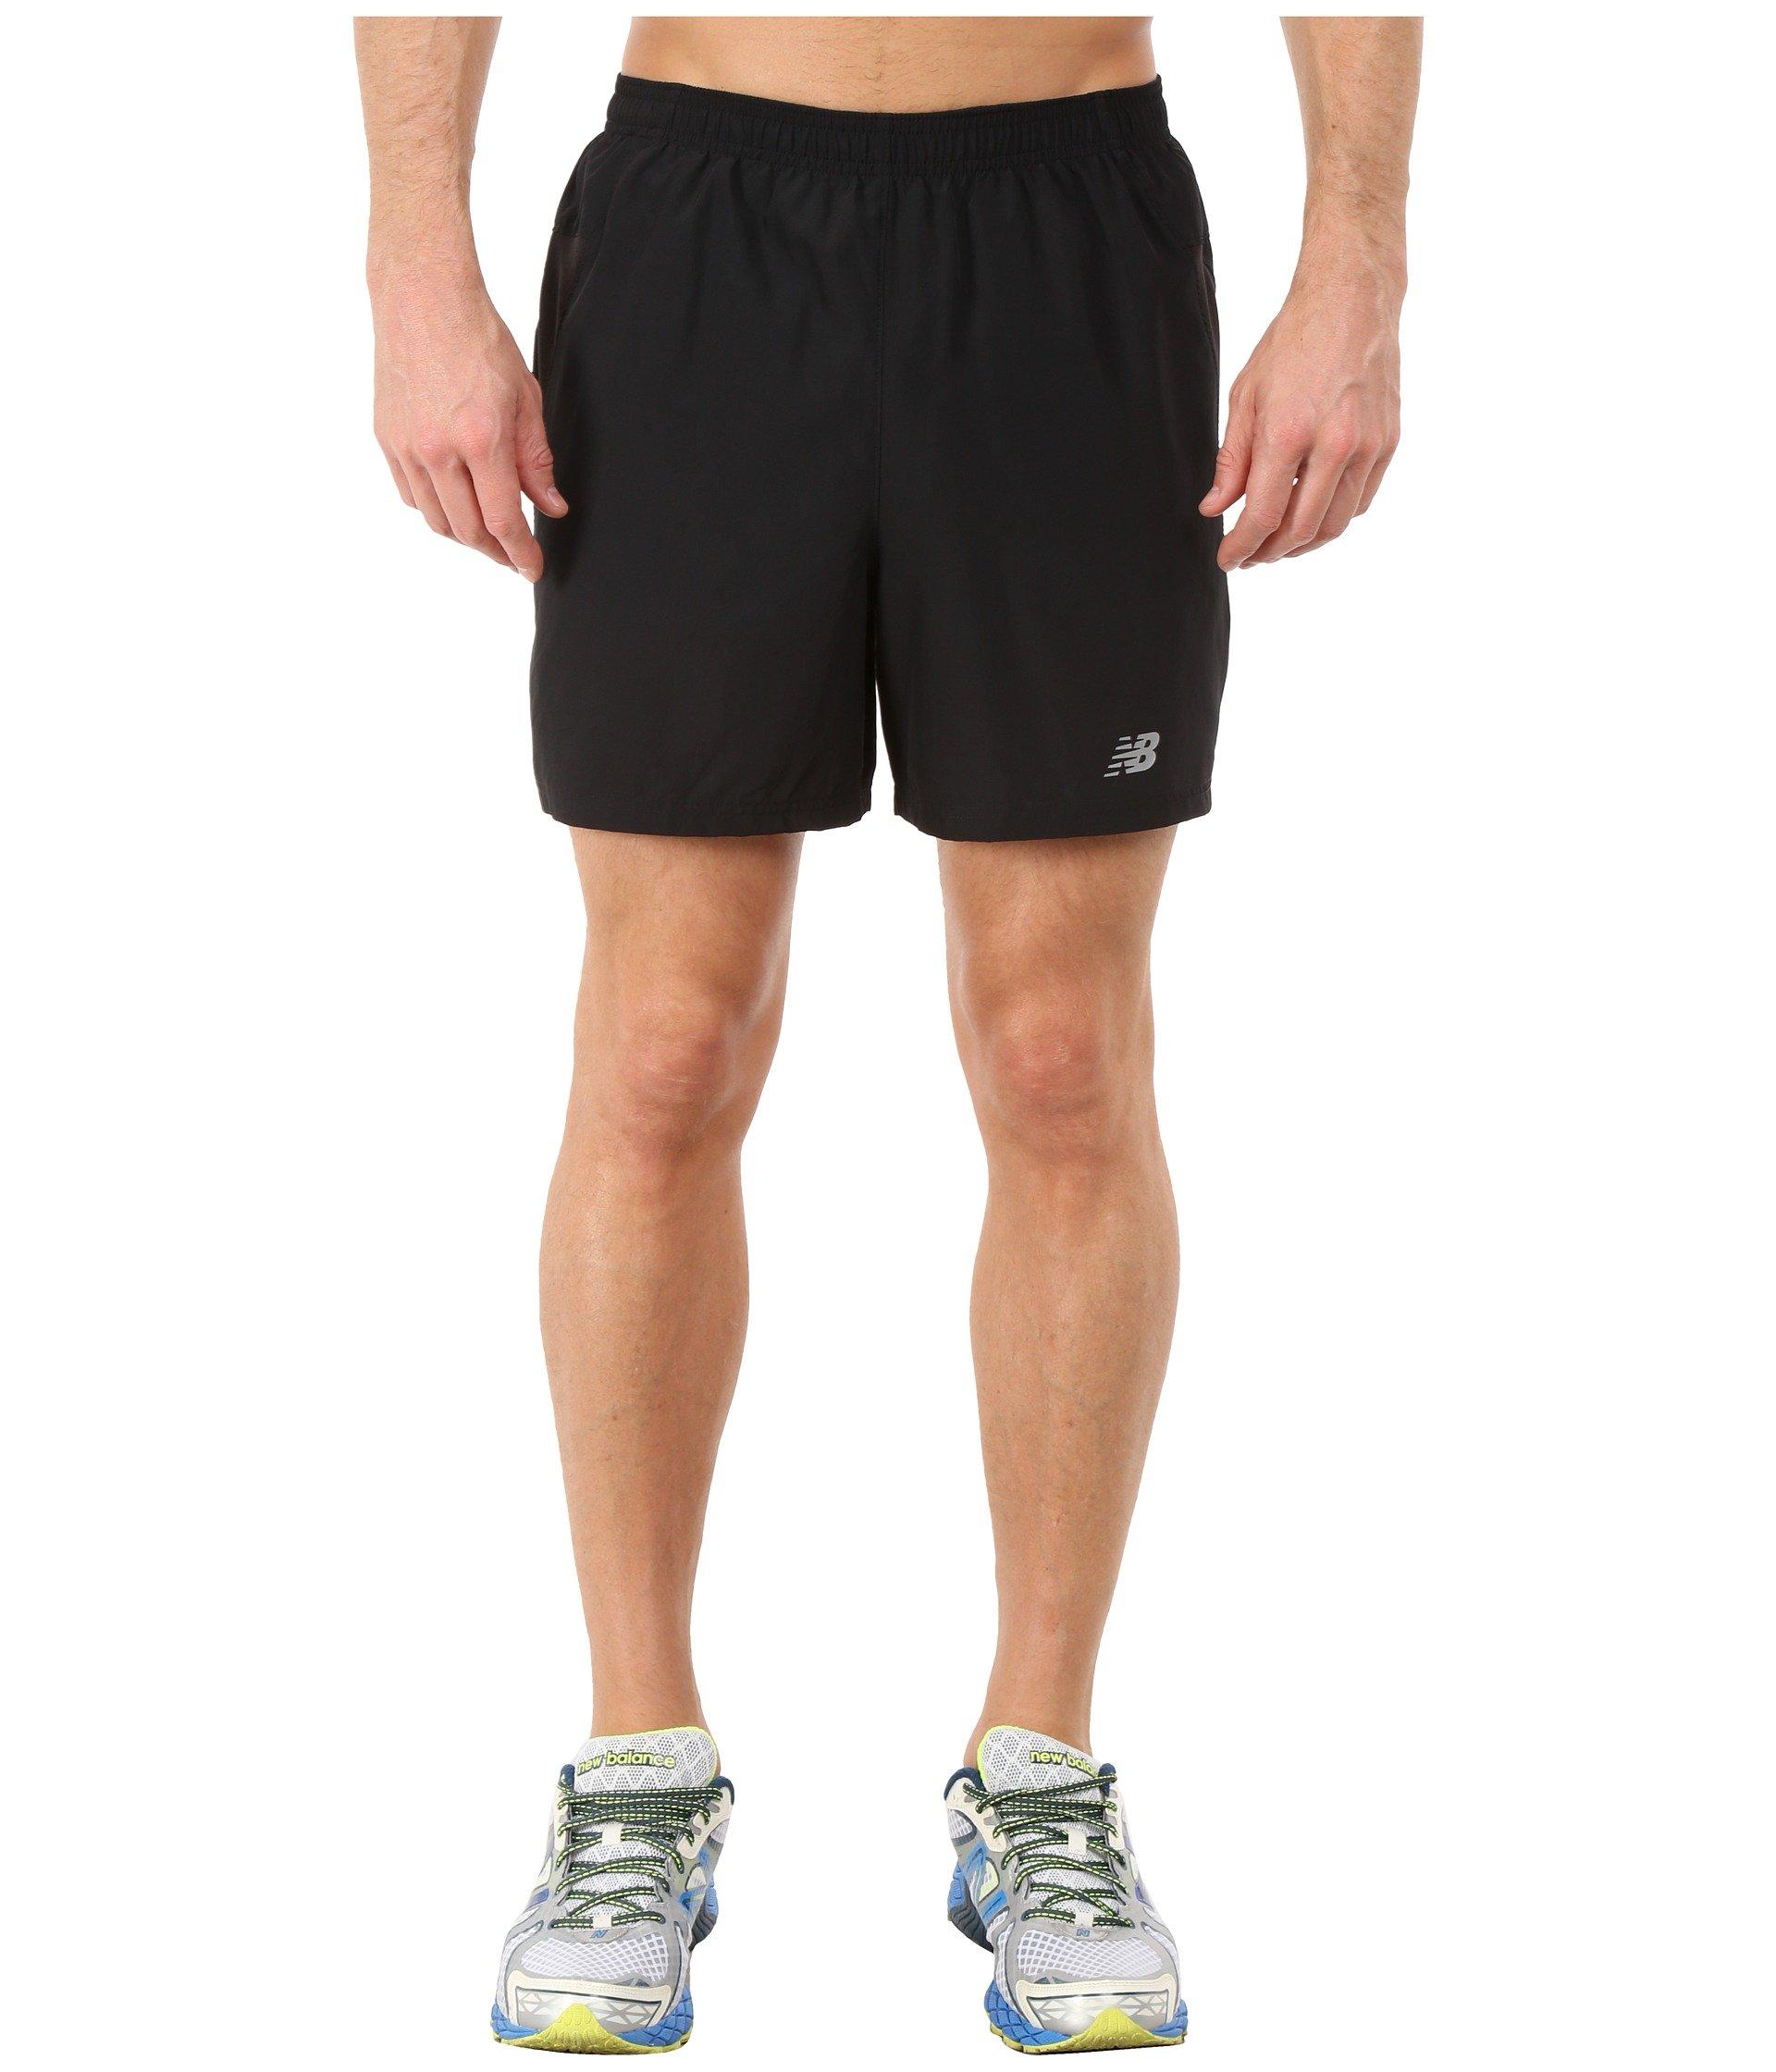 "New Balance Men's 5"" Woven Run Shorts, Black, Small"